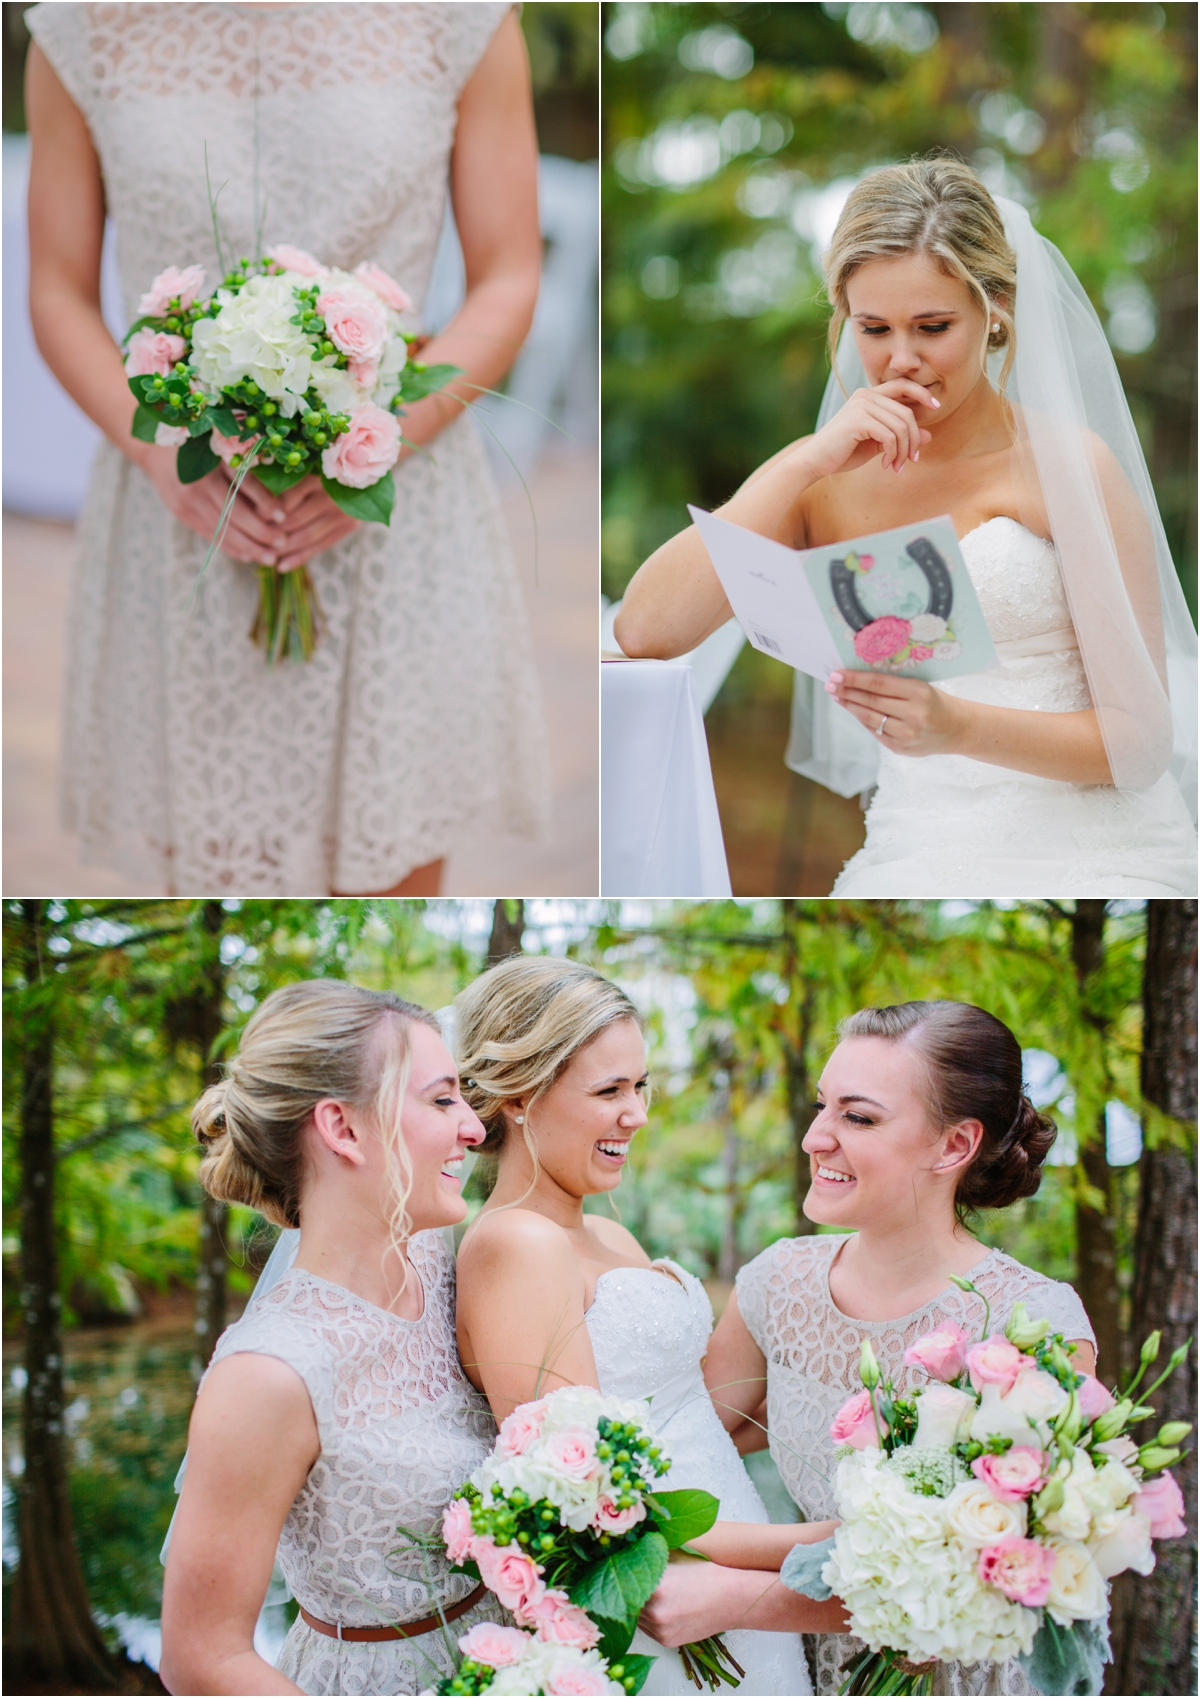 South_Florida_Wedding_Southern_Palm_0005